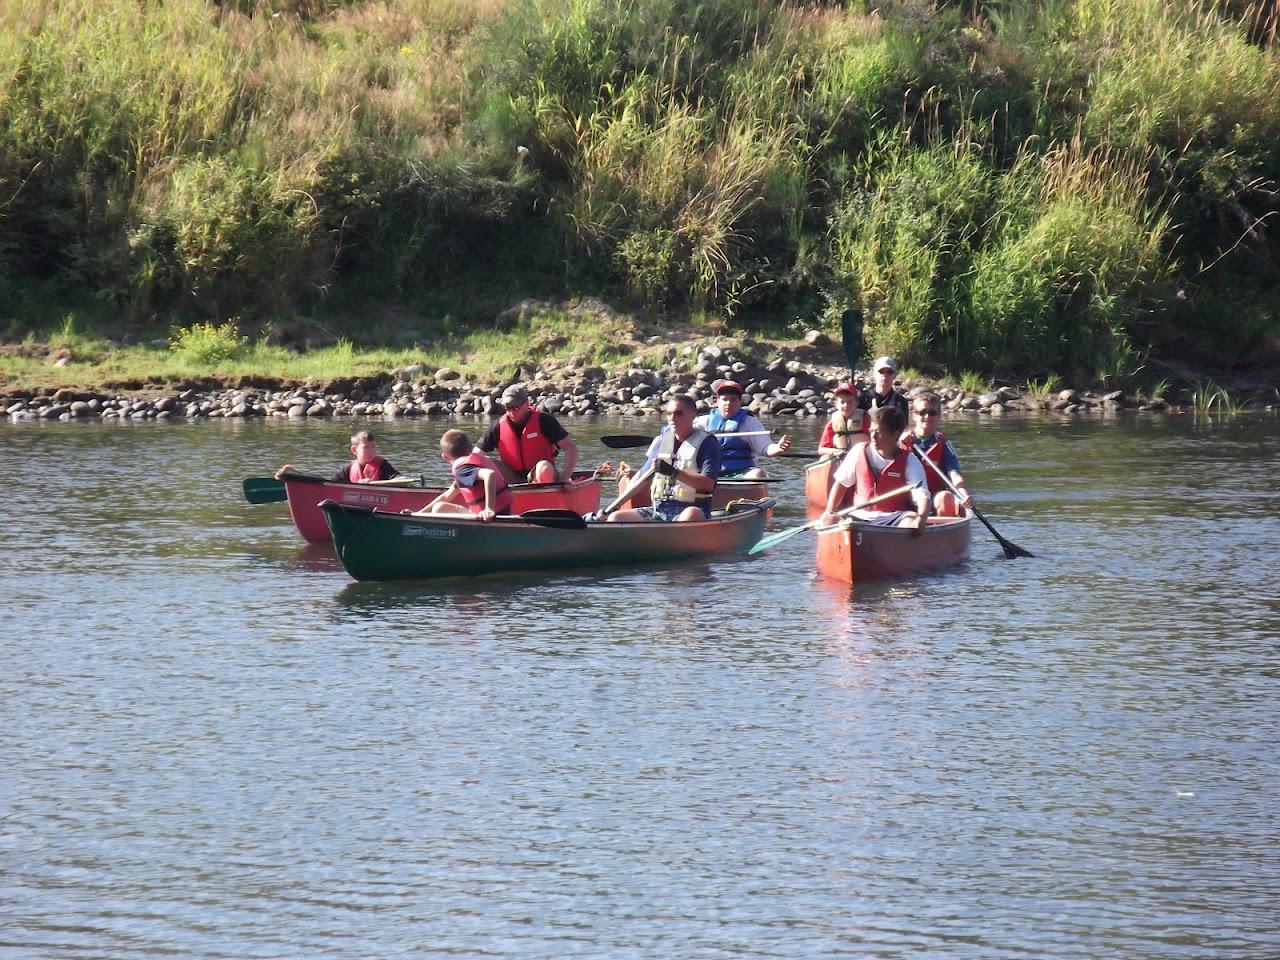 Skookumchuck River 2012 - DSCF1821.JPG